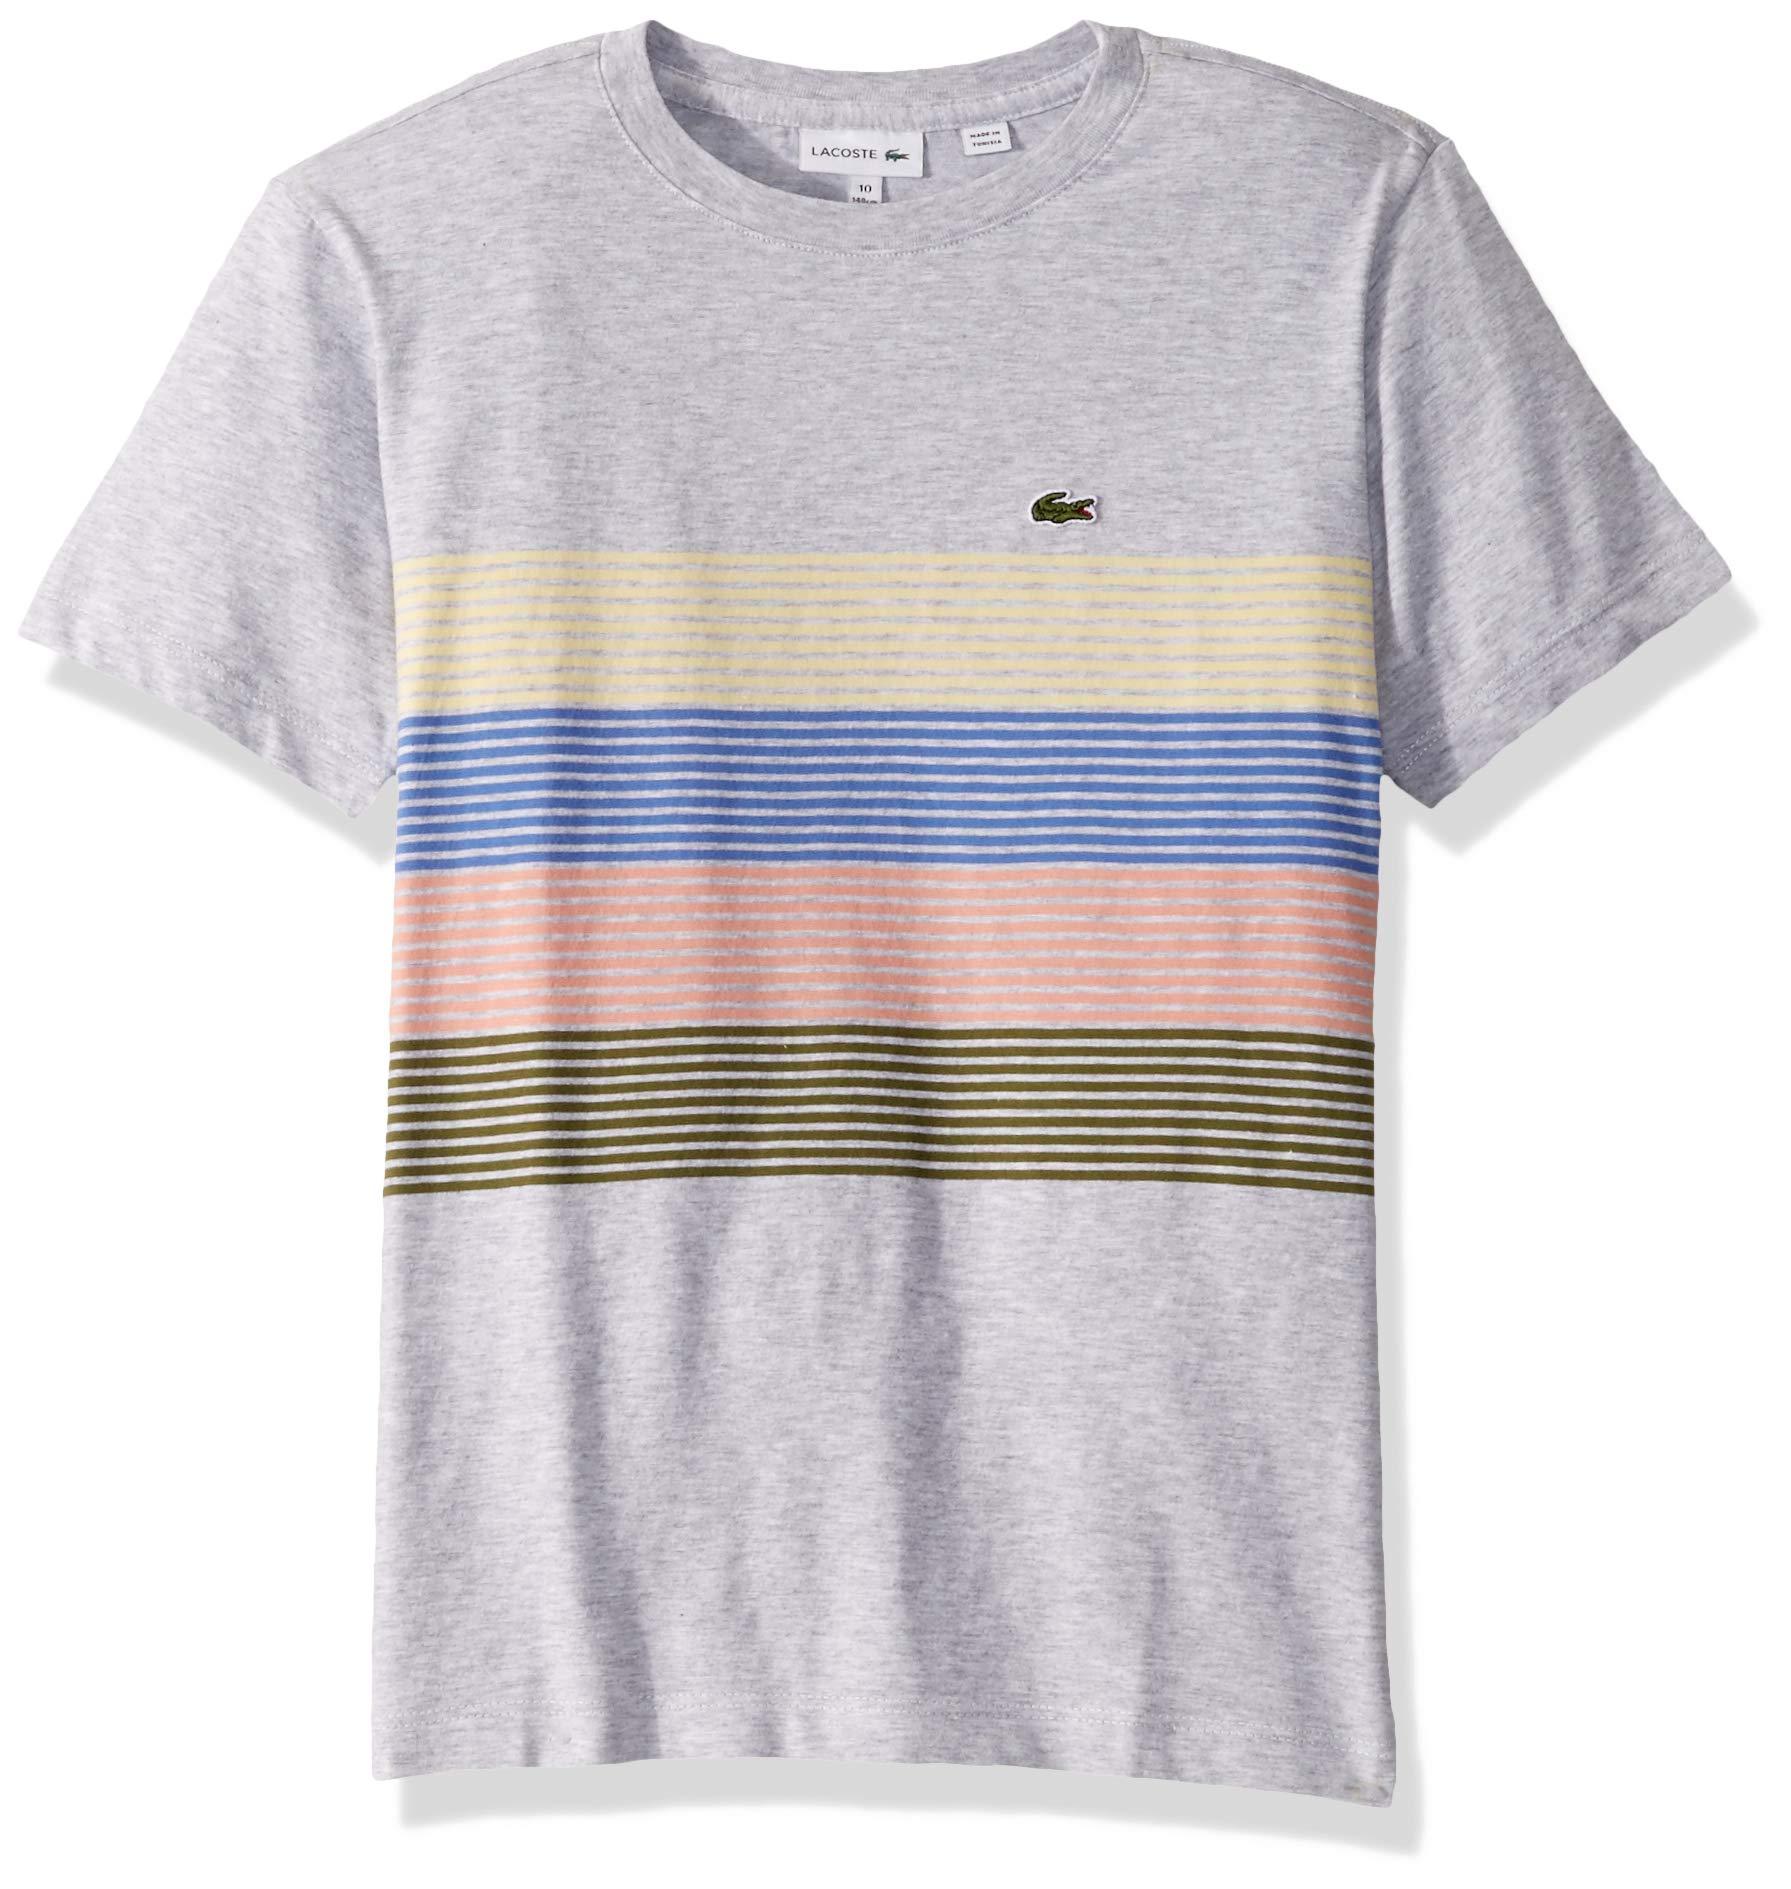 Lacoste Big BOY Color Block Chest Striped T-Shirt, Silver Chine/Marsh/ELF Pink/Milos Blue/NAPOLITAN Yellow, 16YR